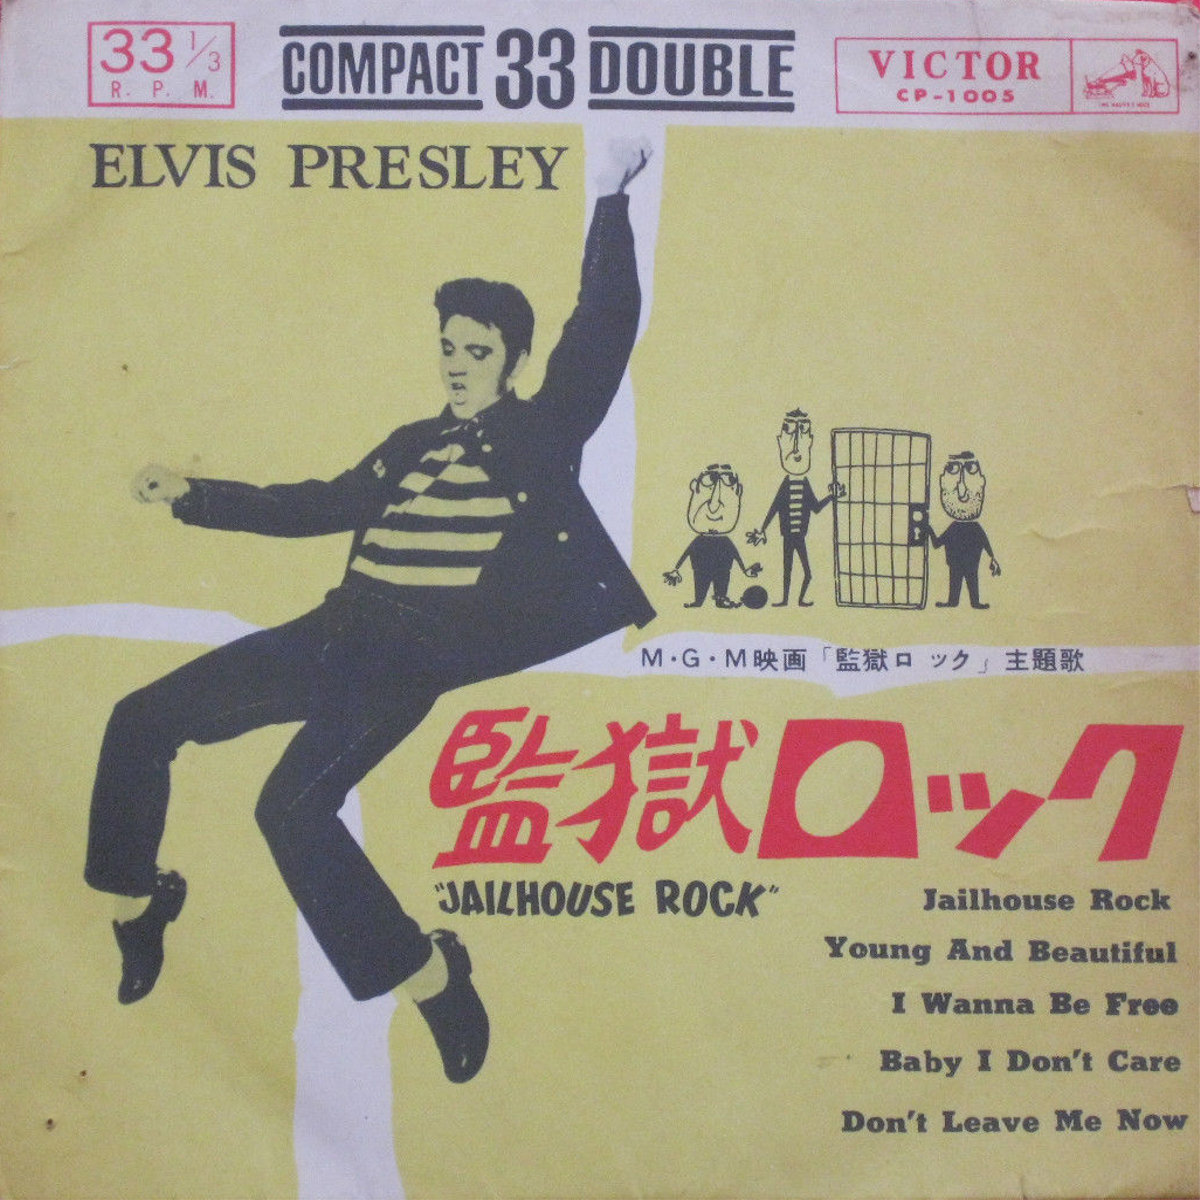 JAILHOUSE ROCK Cp-1005ap8oh8